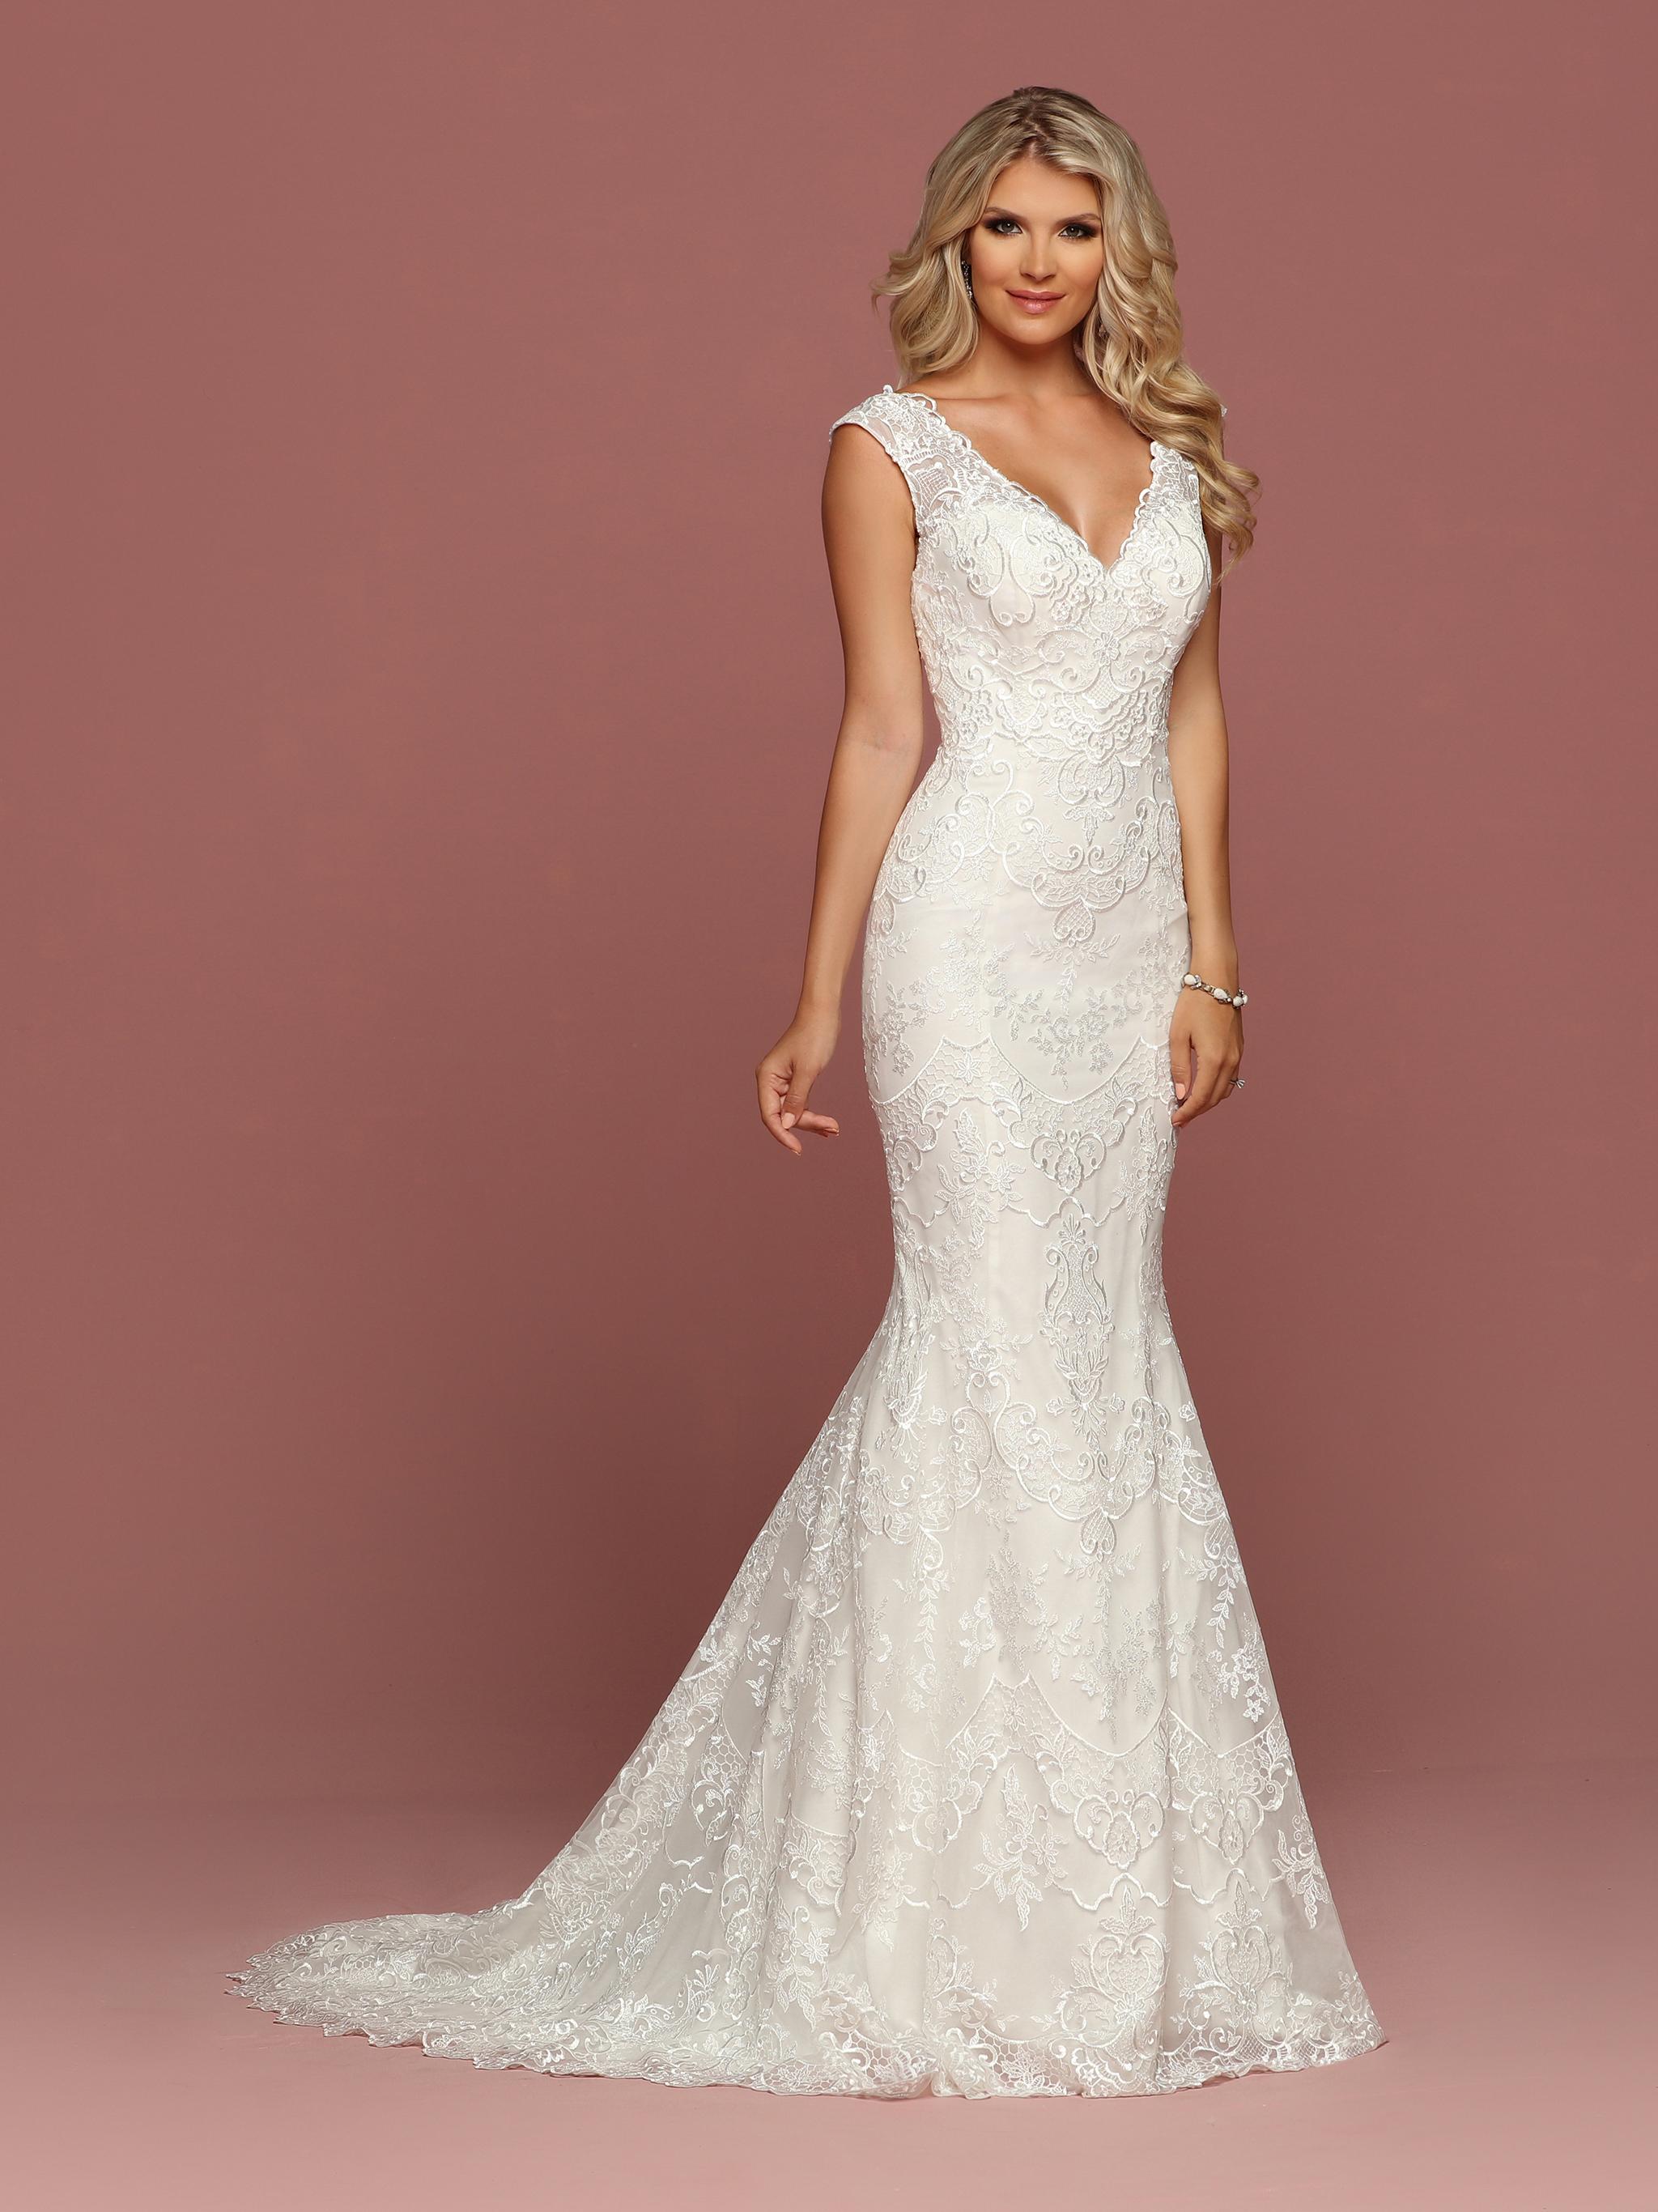 DaVinci Bridal Style #50507 - Front View